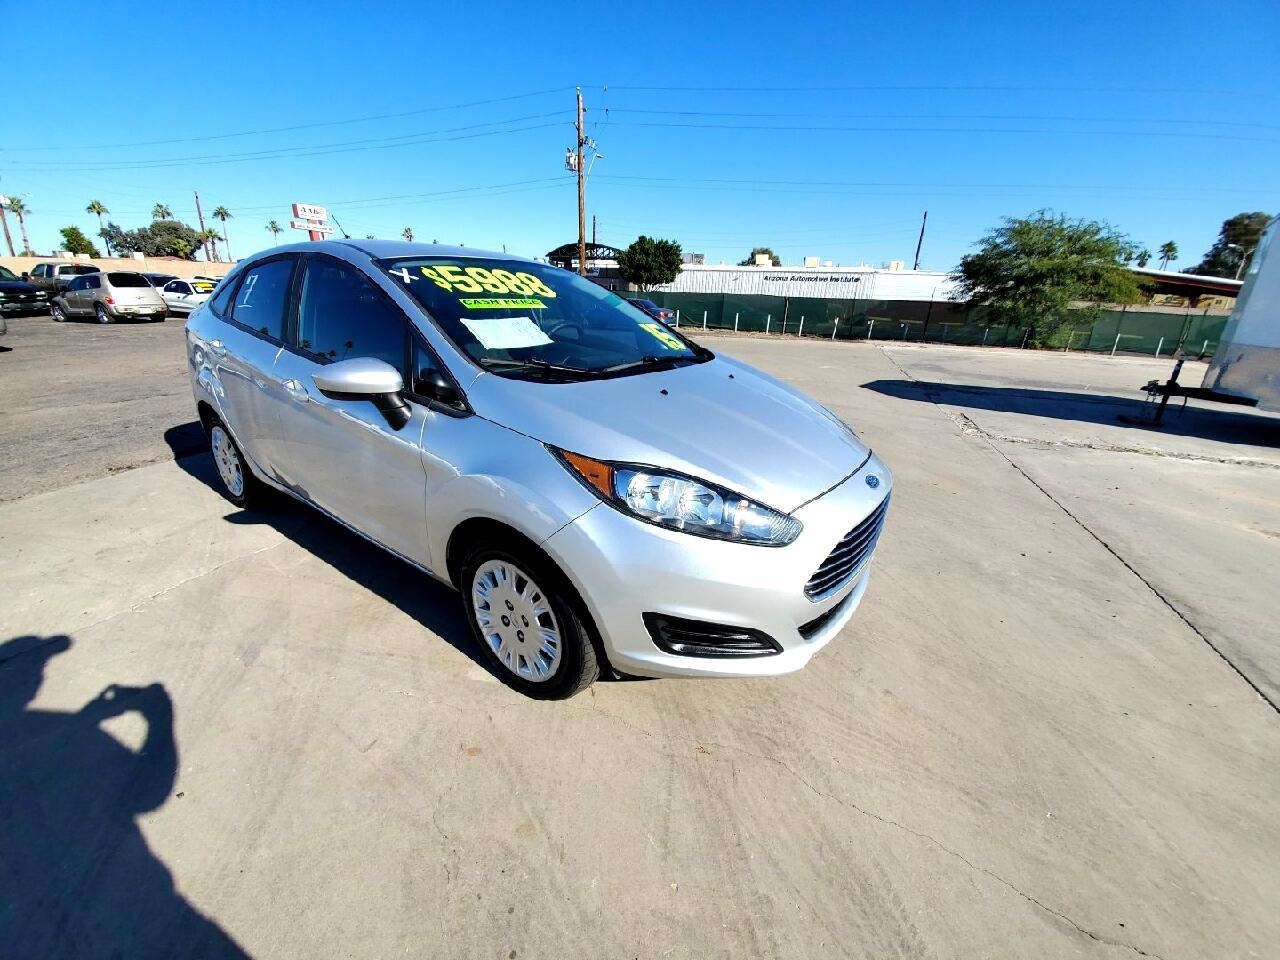 Ford Fiesta Base 2015